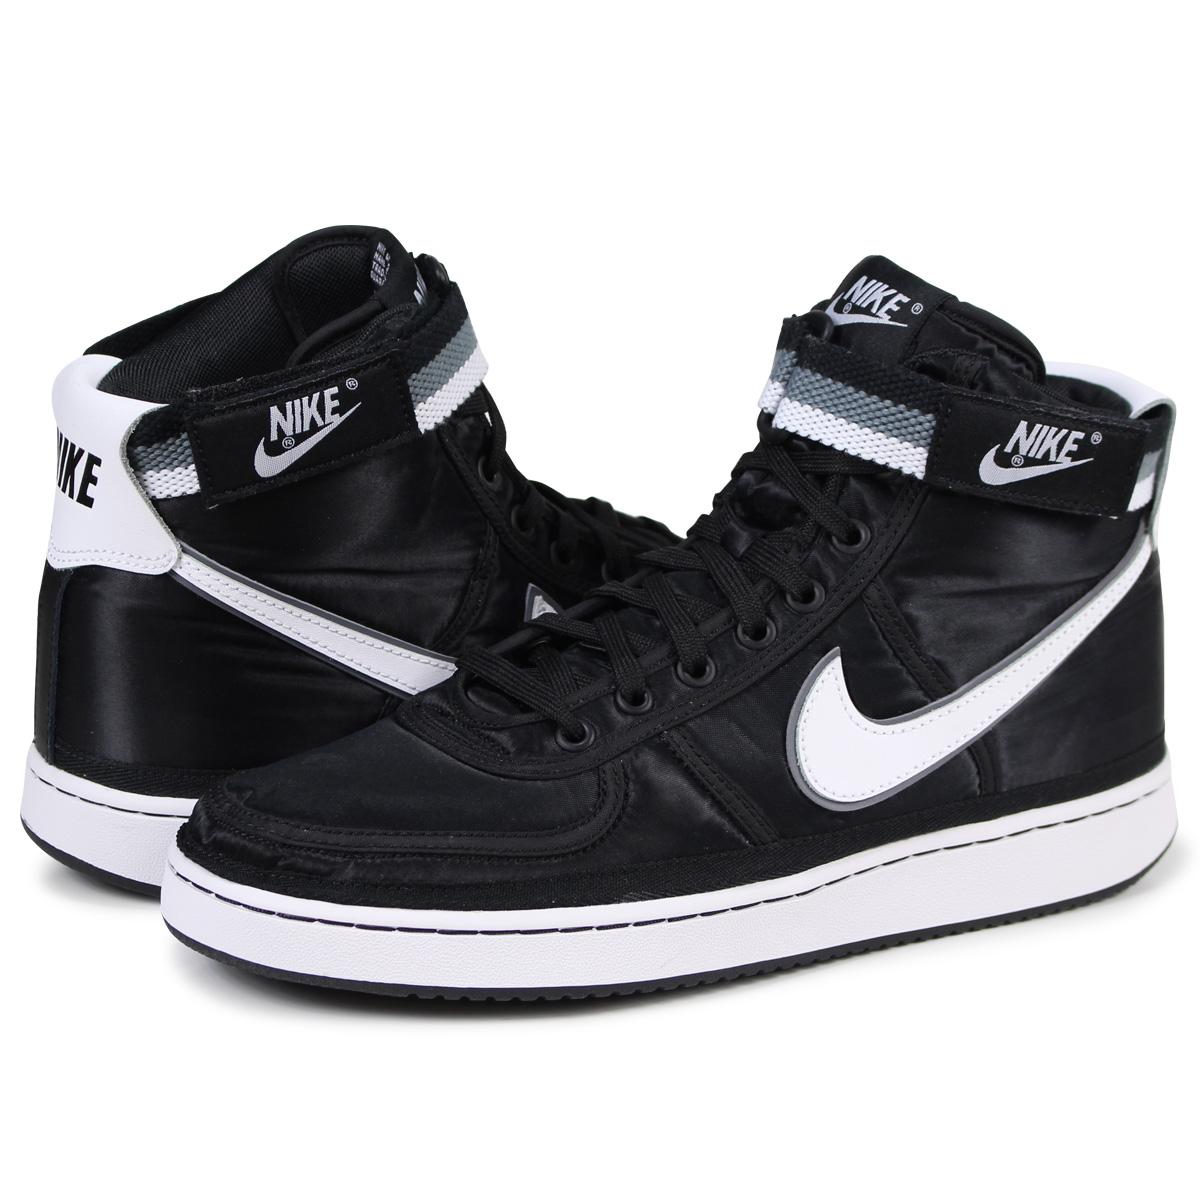 finest selection 53bdd 3f3f4 Whats up Sports NIKE VANDAL HIGH Nike Vandal high sneakers men 318,330-001  black 214 Shinnyu load  Rakuten Global Market